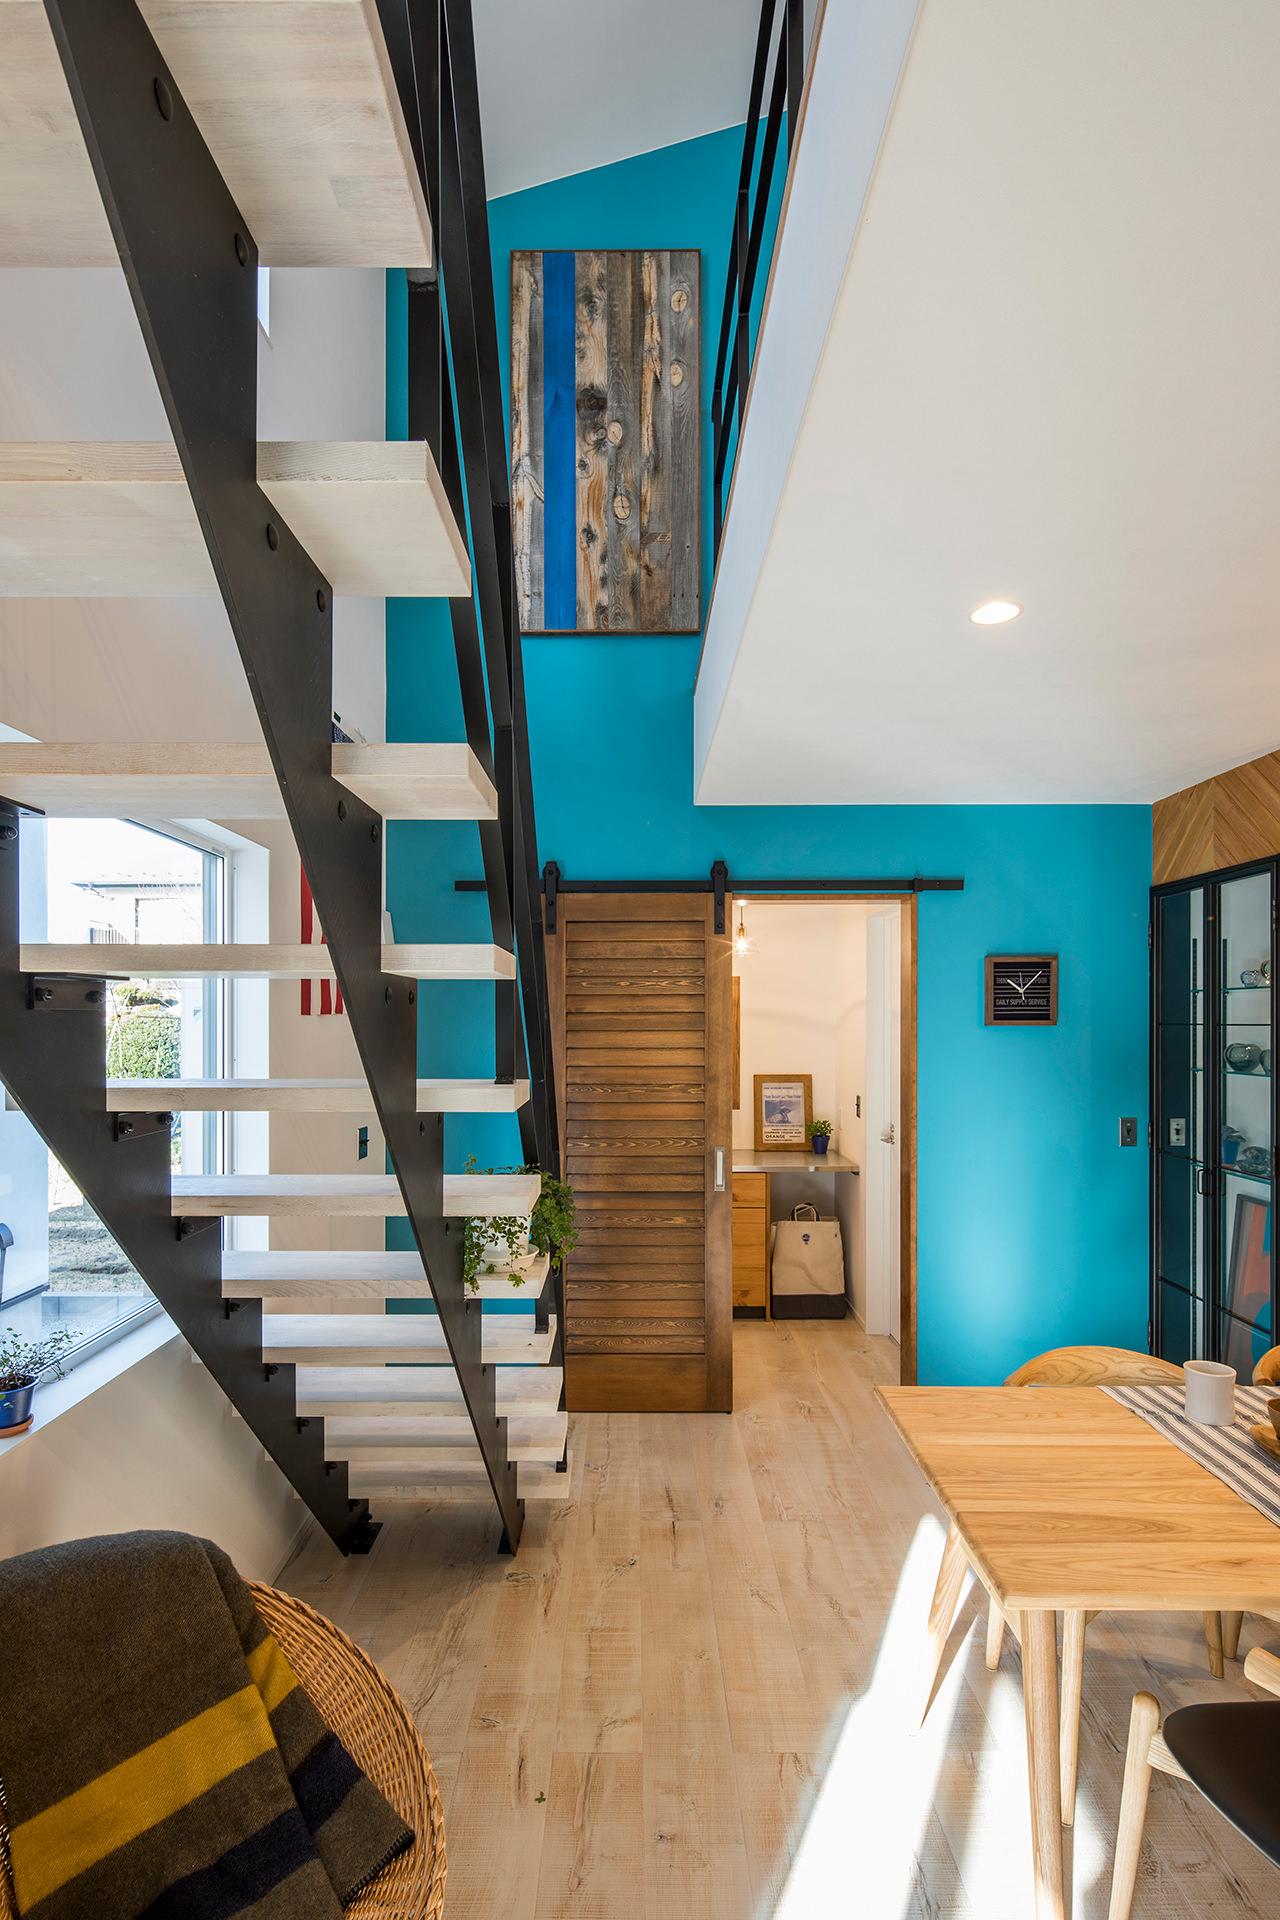 「casa rozzo(Grande blu)」イメージ03 撮影:東涌宏和